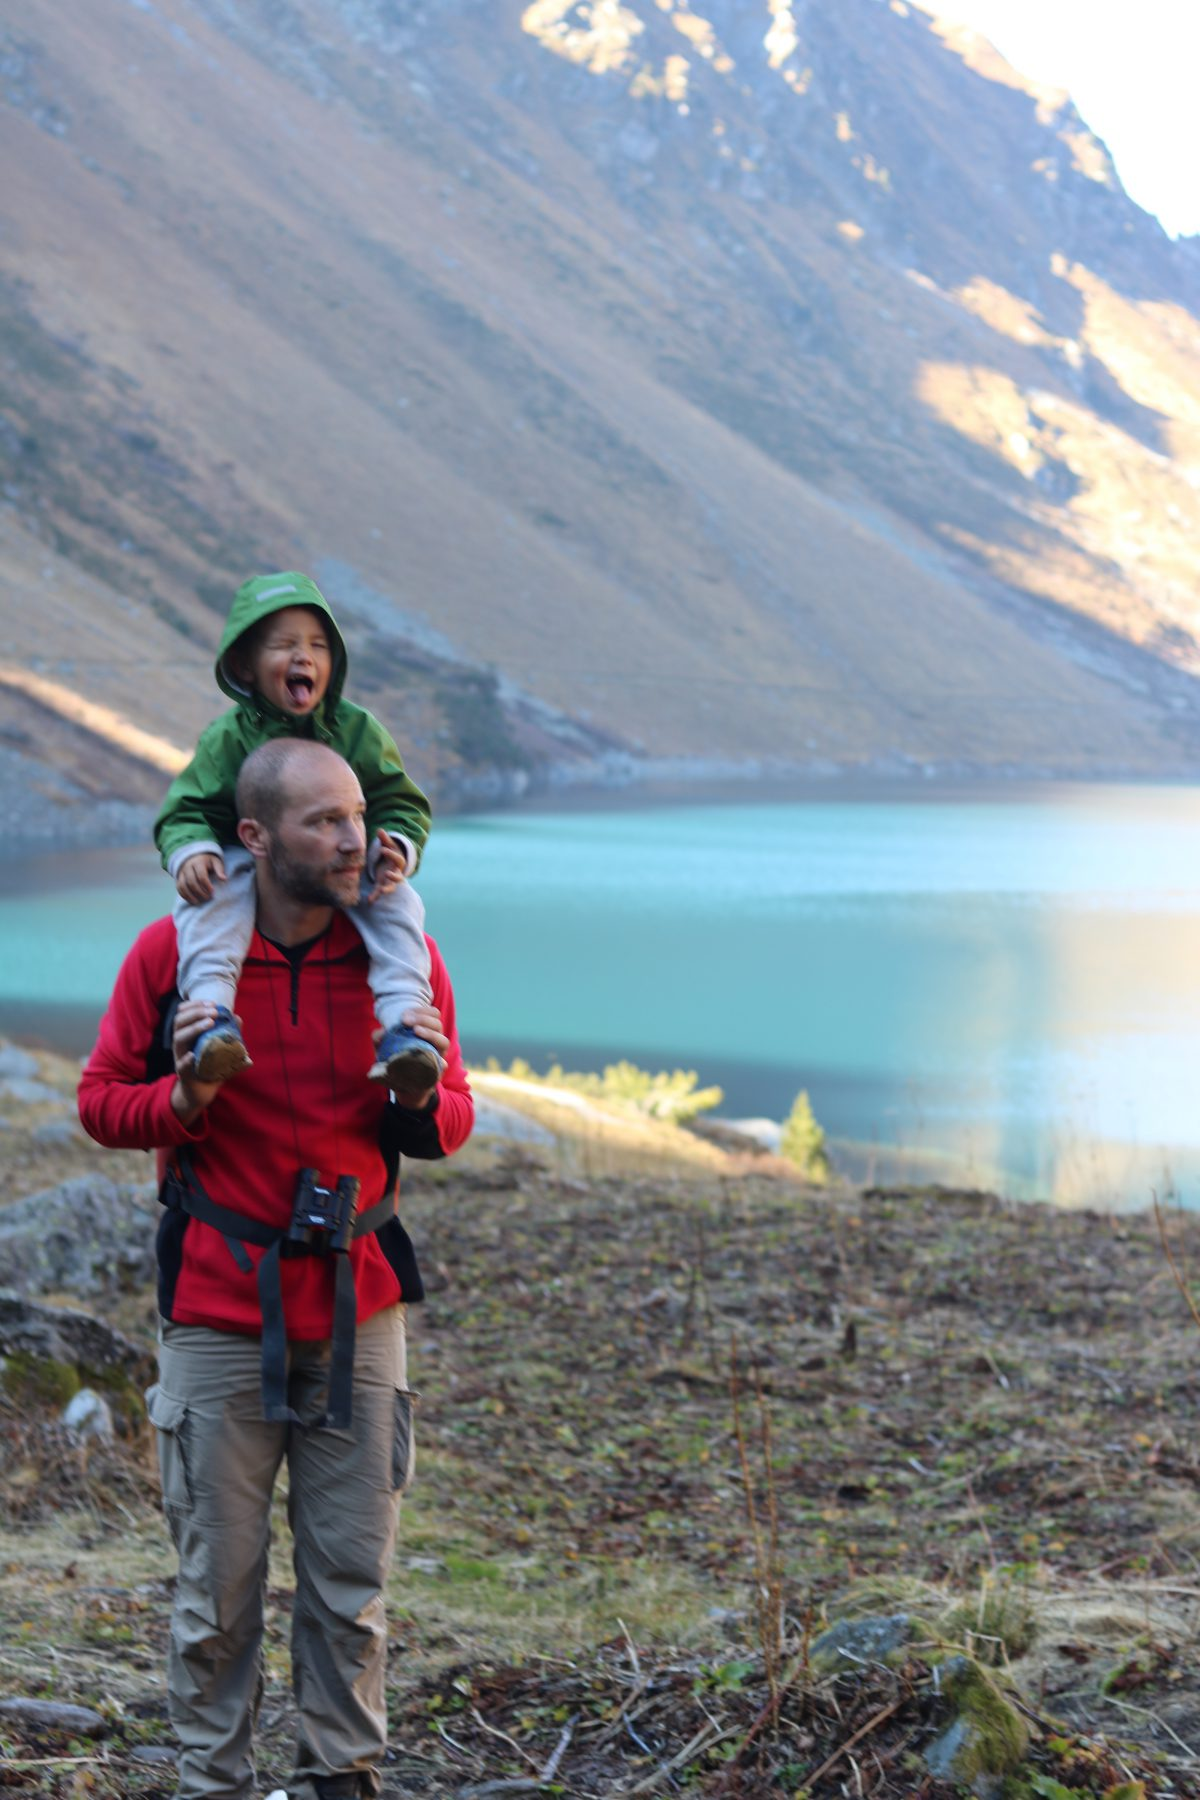 cleuson barrage randonnee famille valais suisse thereseandthelkids blog